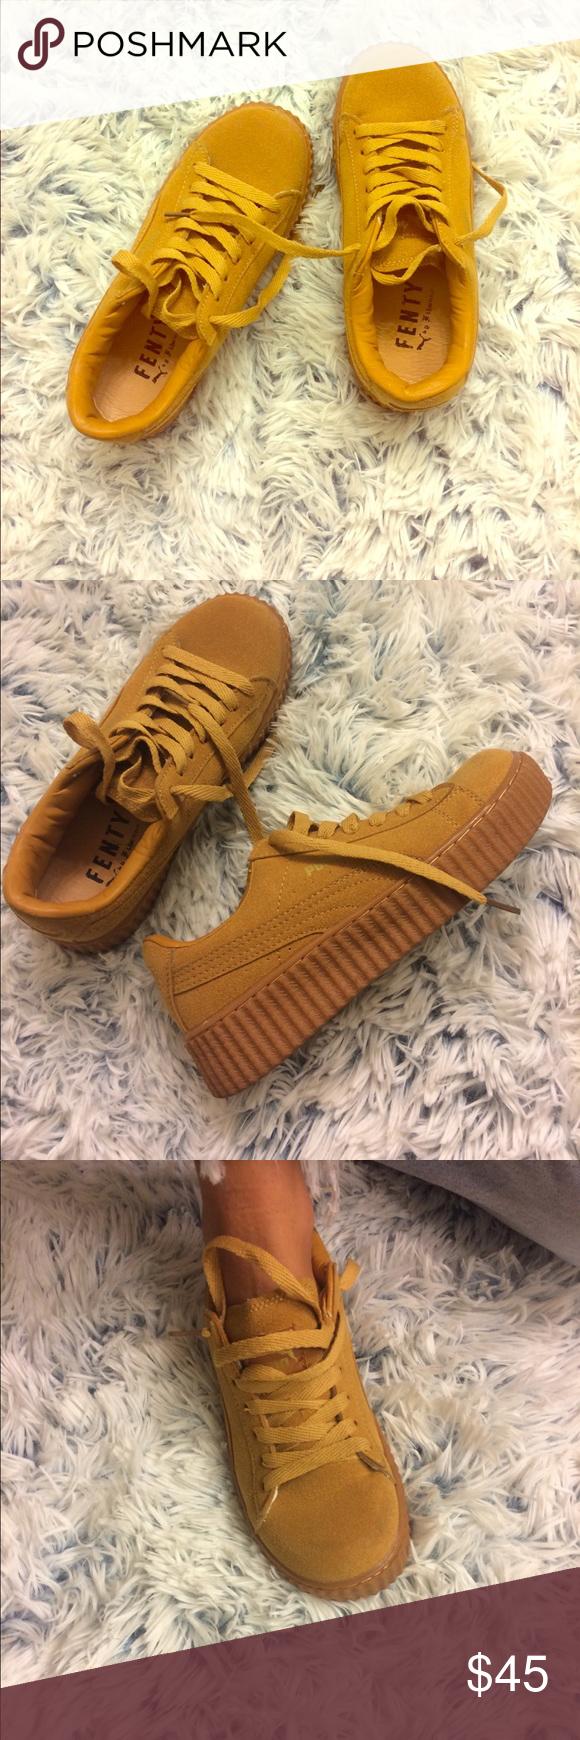 Fenty by Rihanna Puma Creepers Like new! Mustard color. Puma Shoes Sneakers ba91b60ec